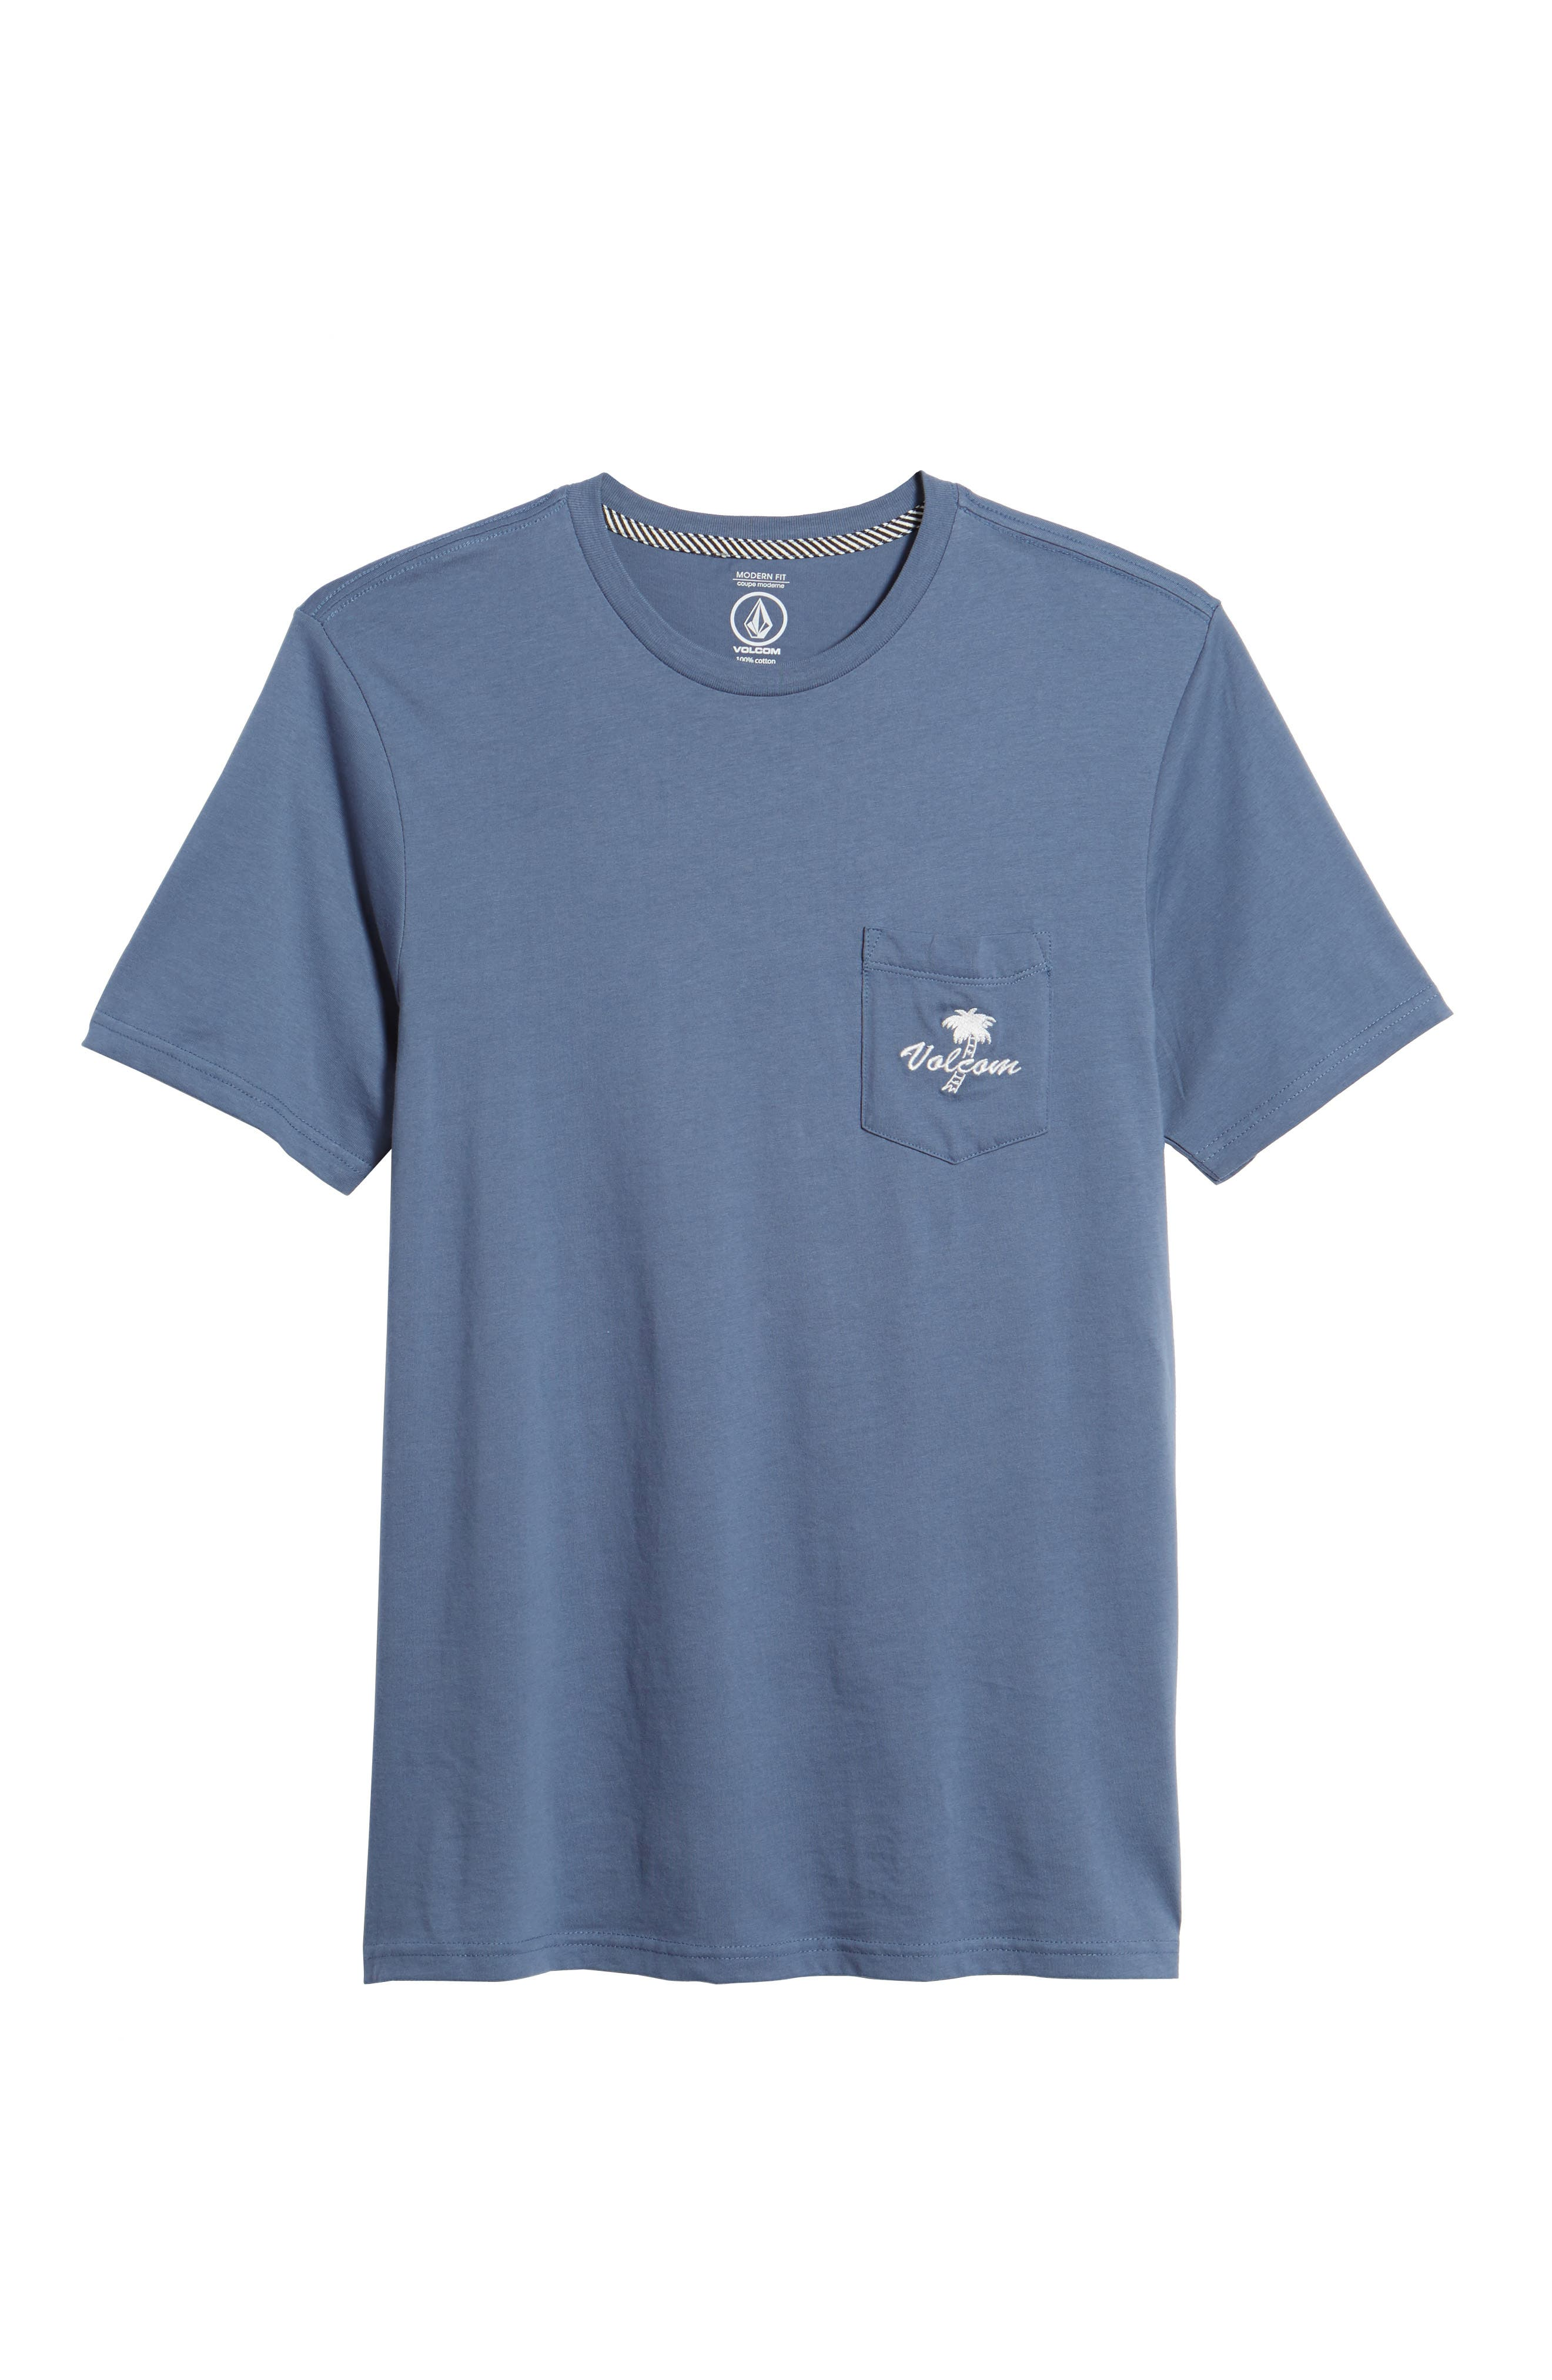 Last Resort Pocket T-Shirt,                             Alternate thumbnail 6, color,                             Deep Blue